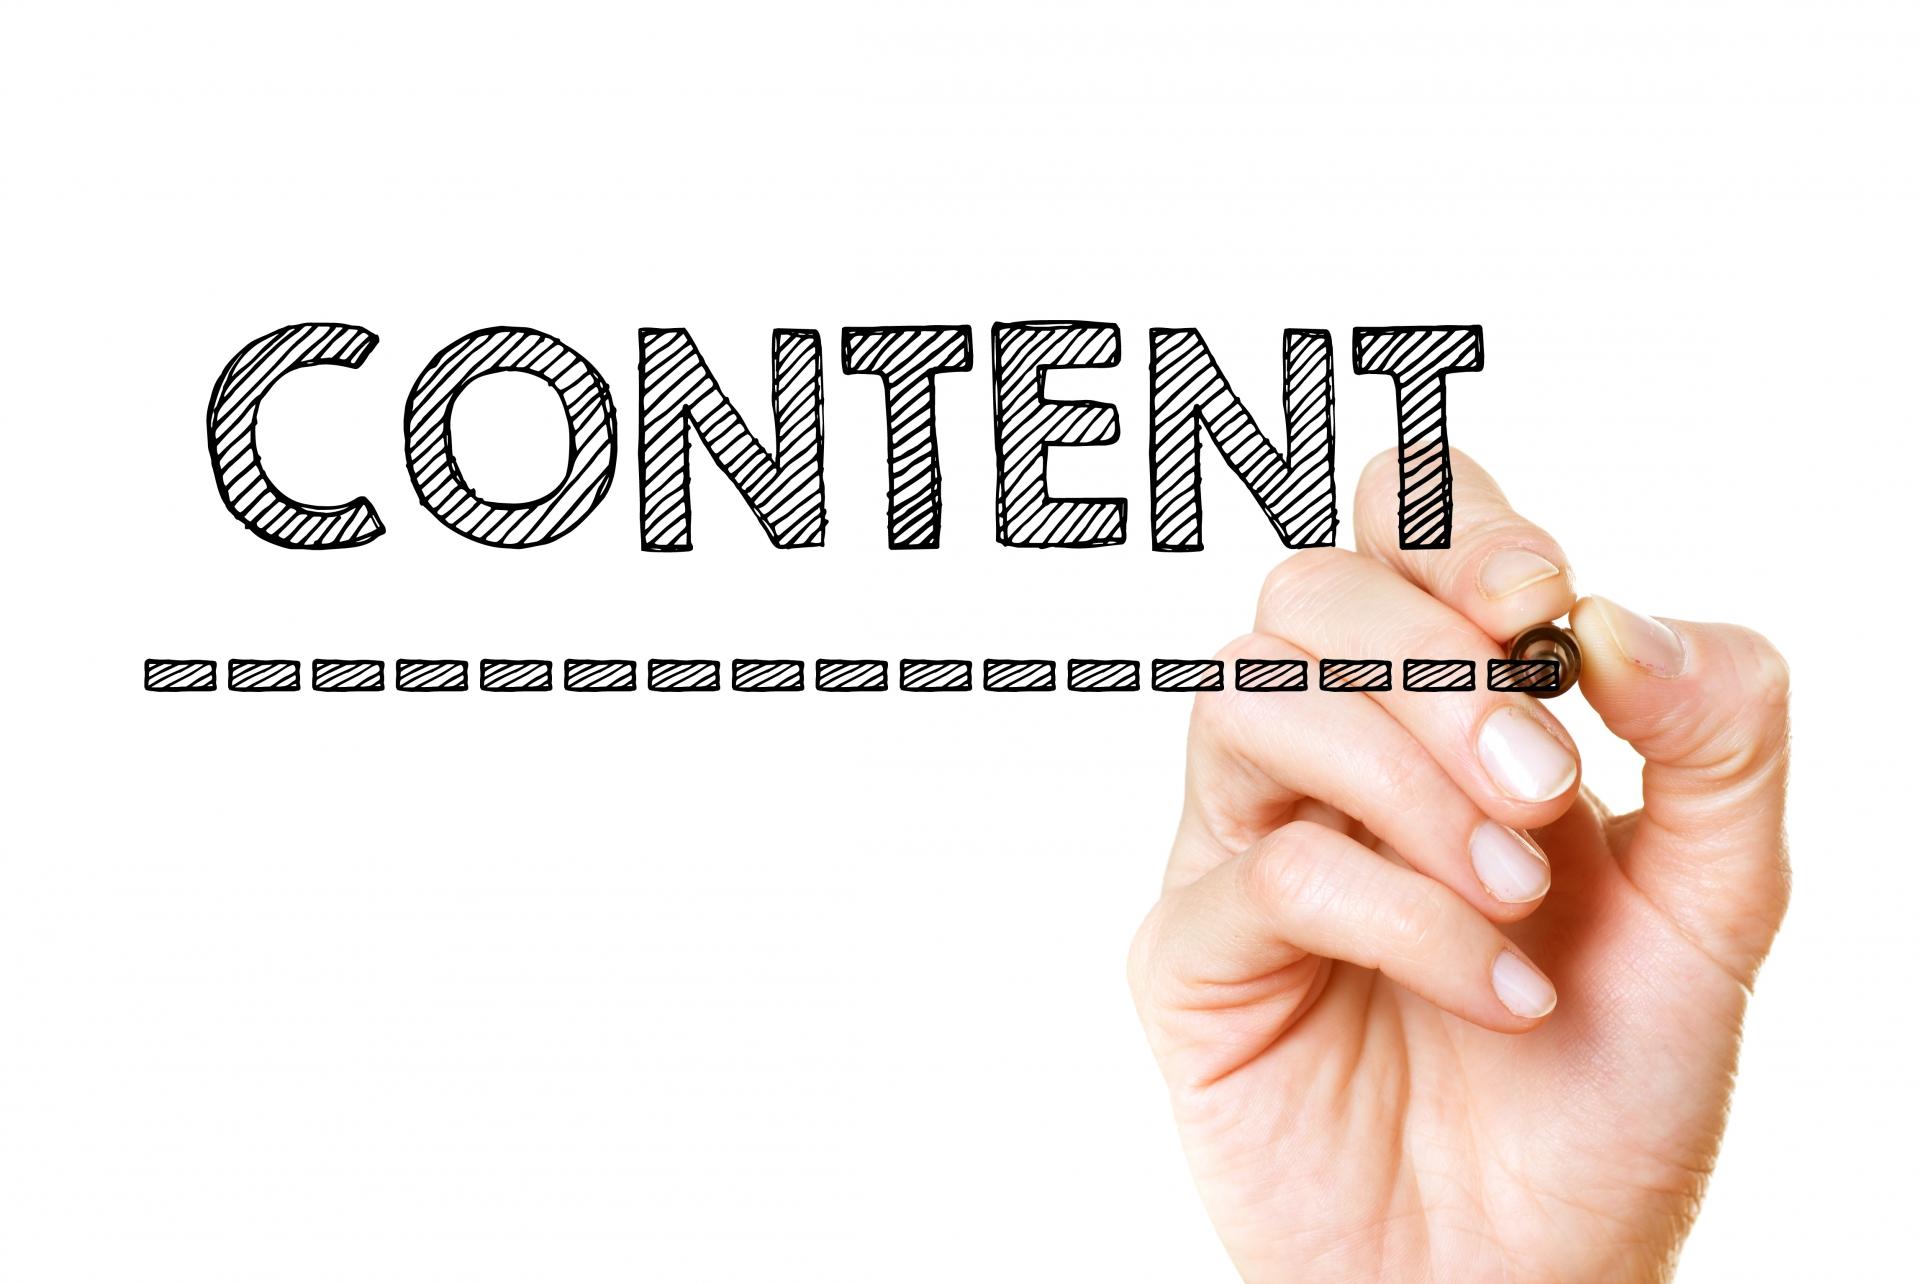 5-cau-hoi-can-co-khi-ban-lam-content-marketing-1